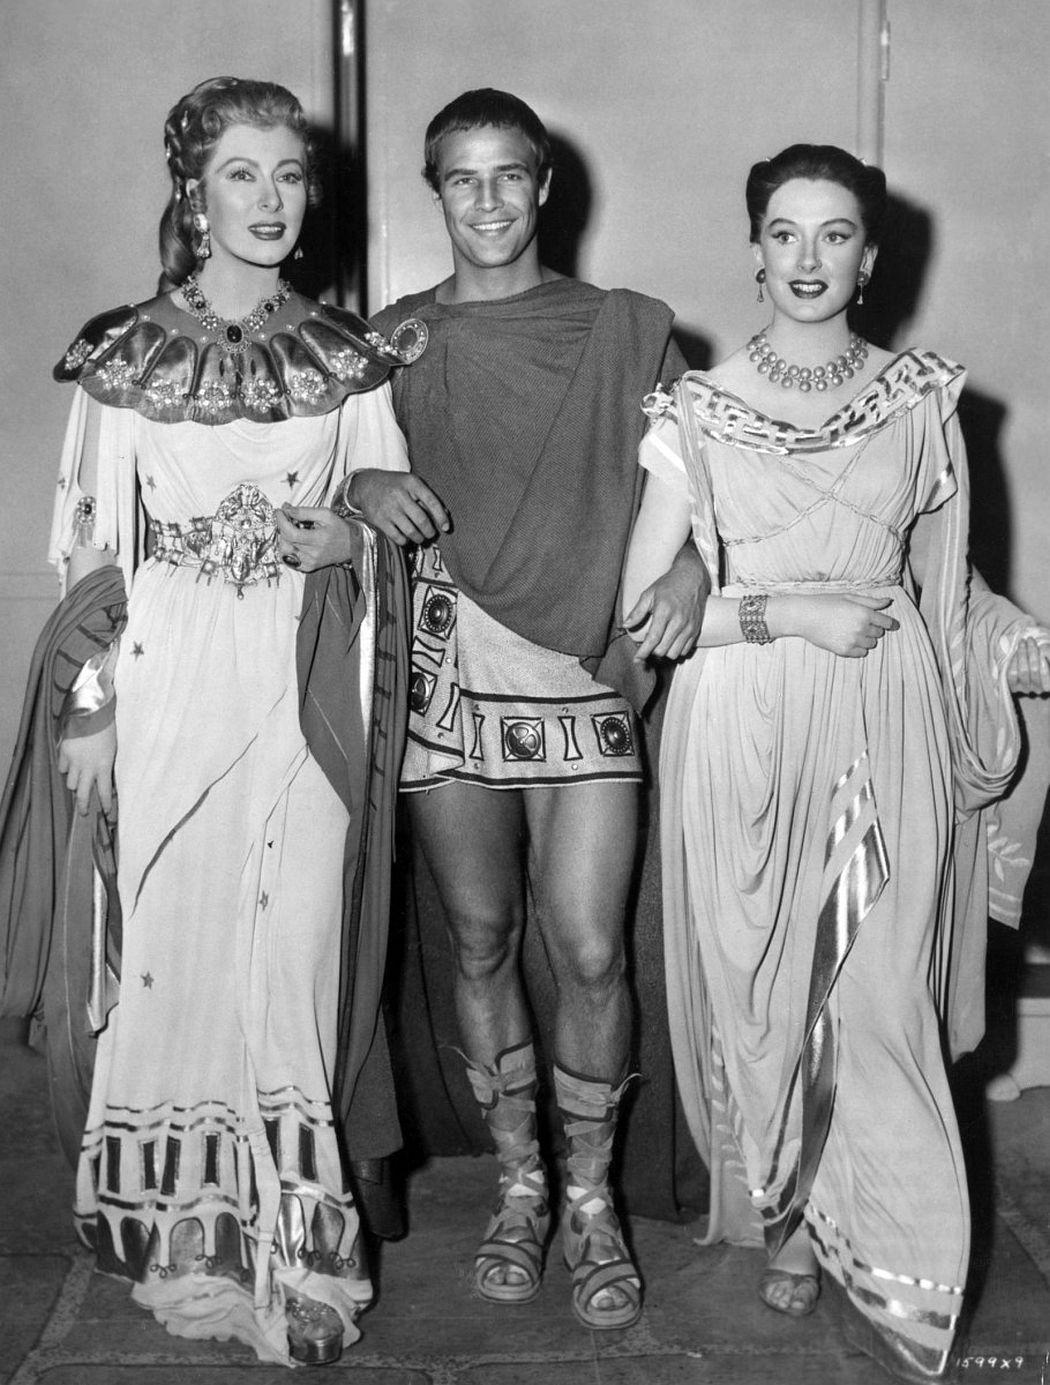 Marlon Brando as Mark Antony in 'Julius Caesar' (1953)